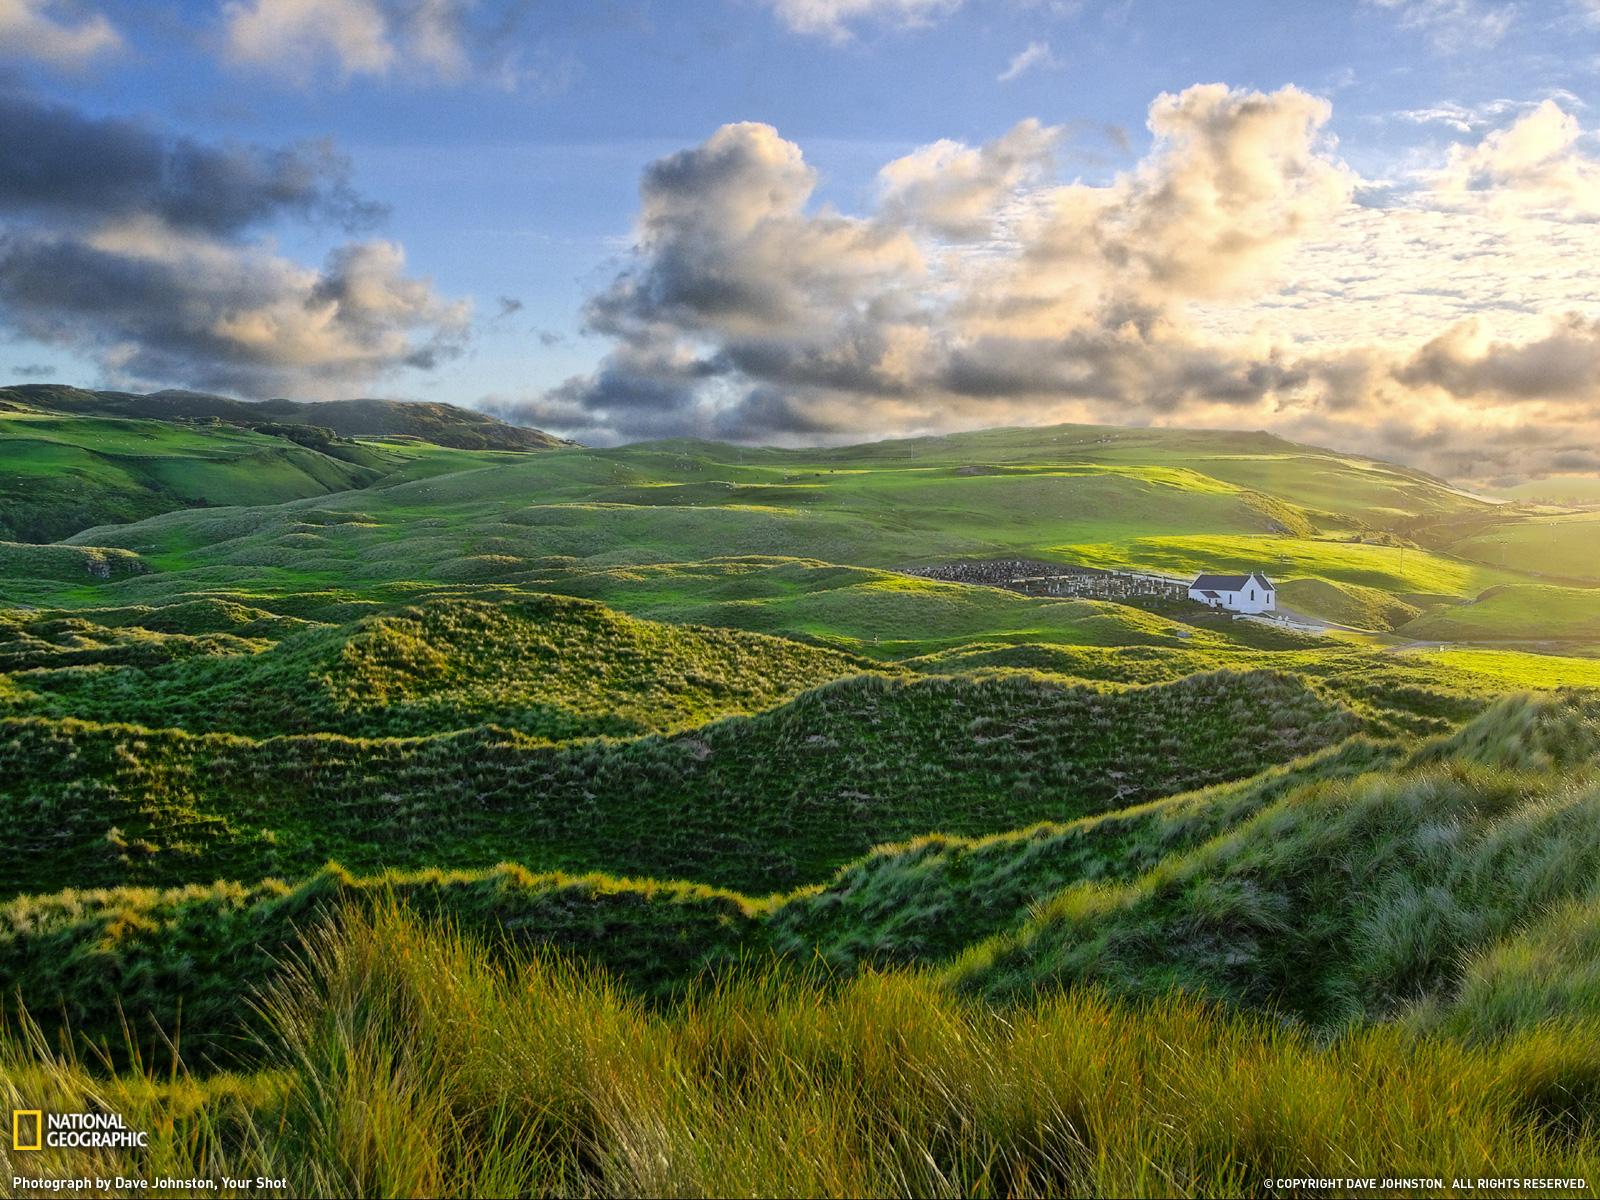 Ireland Desktop Backgrounds Wallpaper 1600x1200 1600x1200